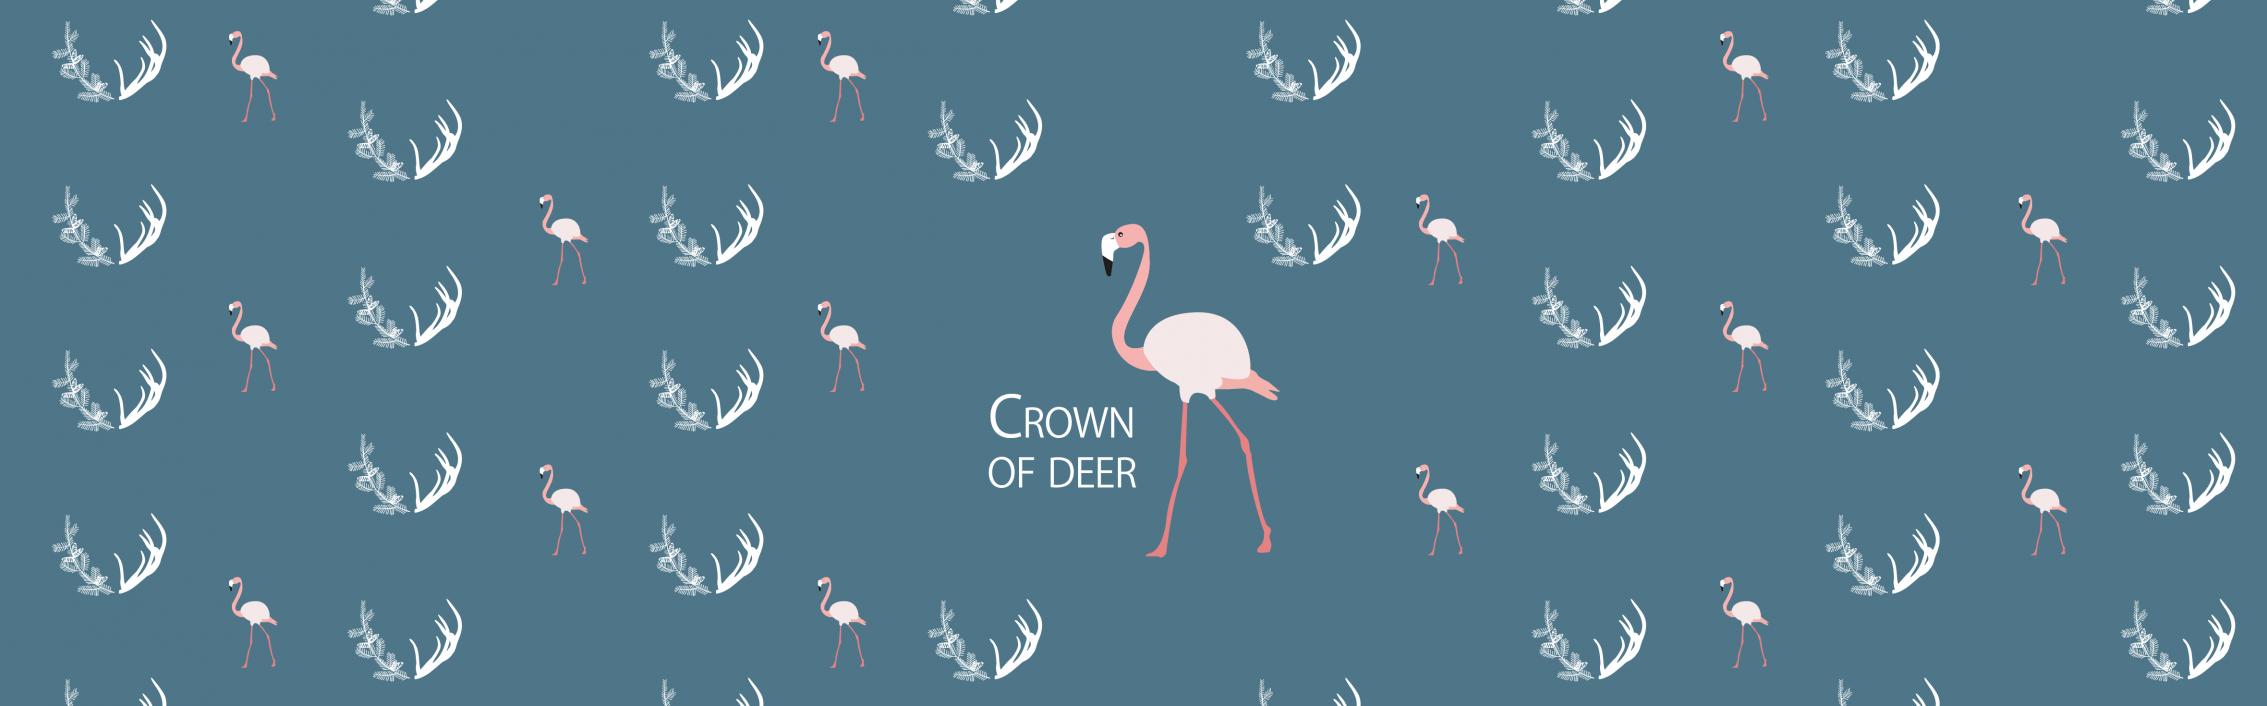 drawing-crownofdeer-home-decoration